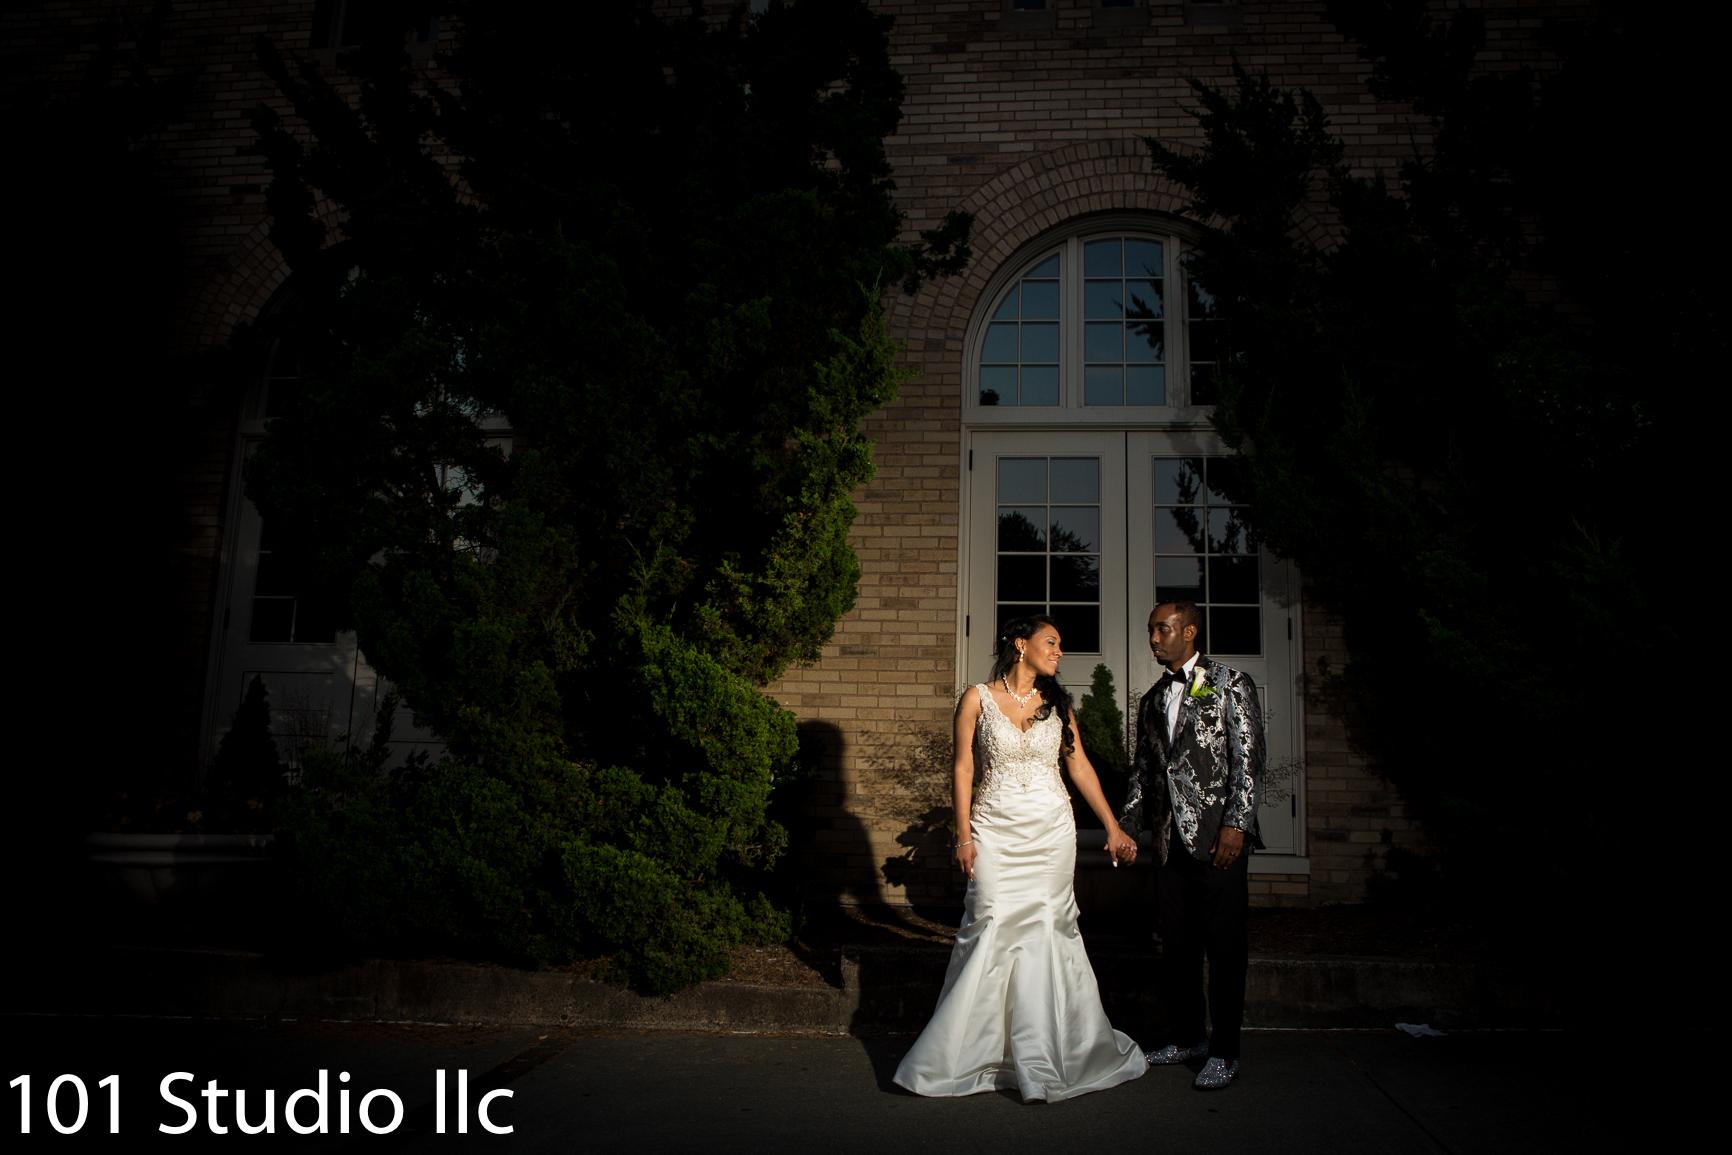 Raleigh  wedding photographer - 101 Studio llc -16.jpg